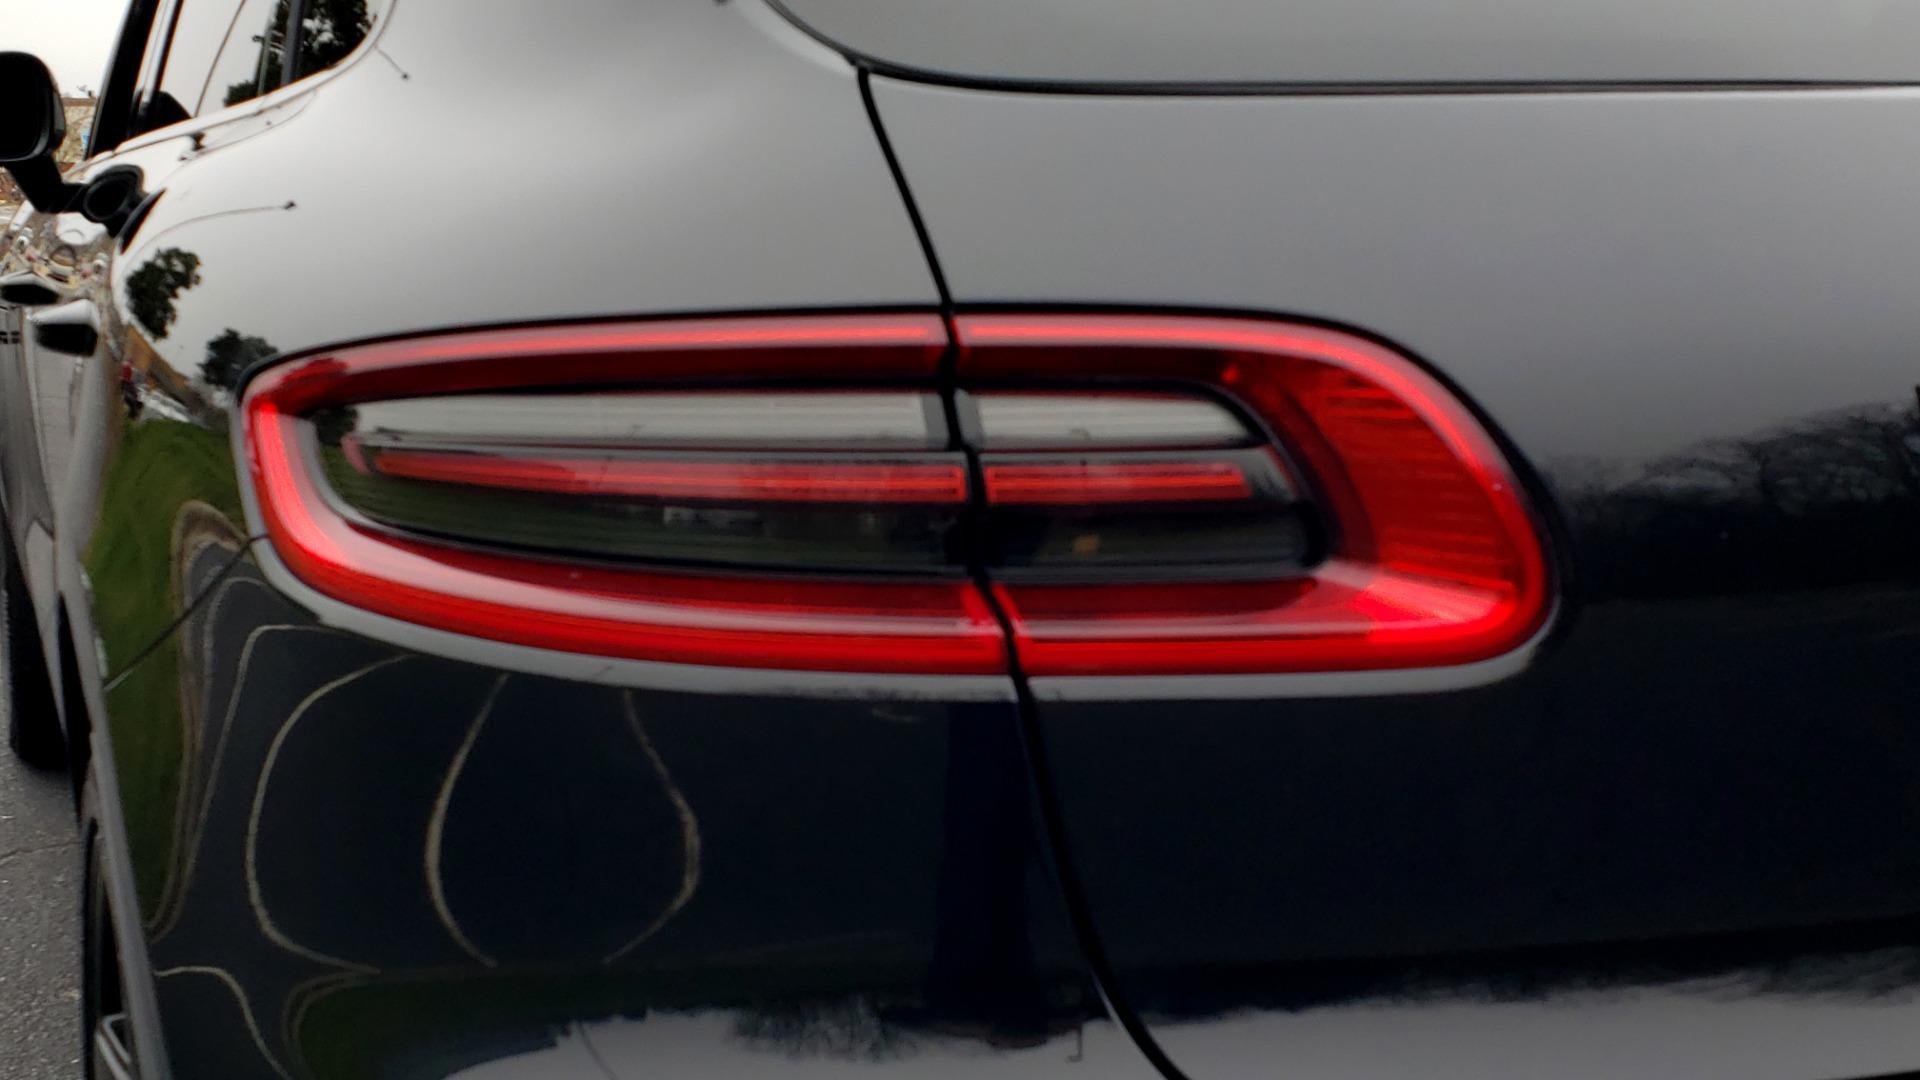 Used 2016 Porsche MACAN TURBO / PREM / NAV / PARK ASST / BOSE / PDK / CHRONO PKG for sale Sold at Formula Imports in Charlotte NC 28227 26